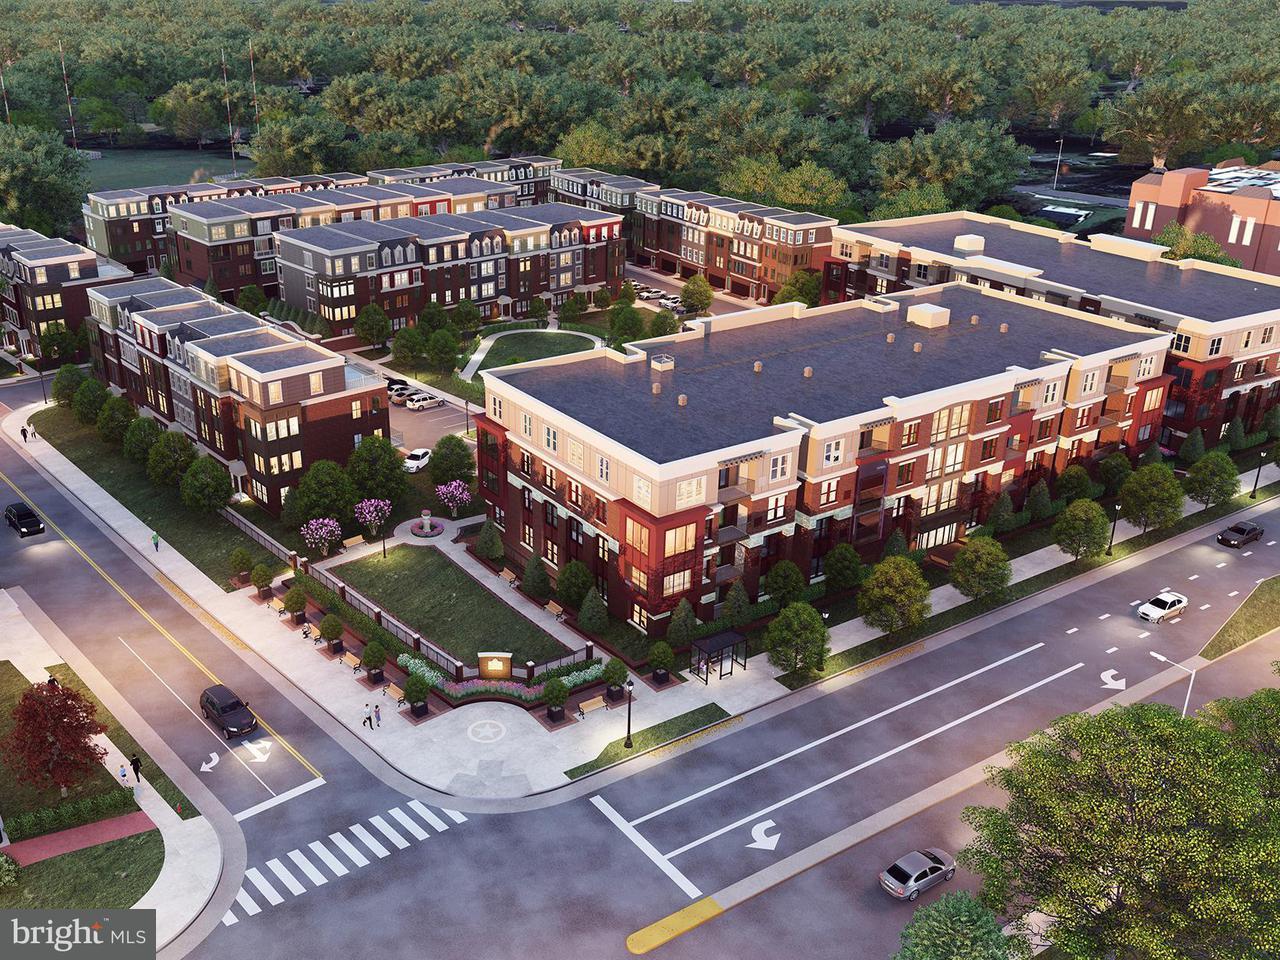 Additional photo for property listing at 3989 Norton Pl #20301 3989 Norton Pl #20301 Fairfax, Virginia 22030 Verenigde Staten